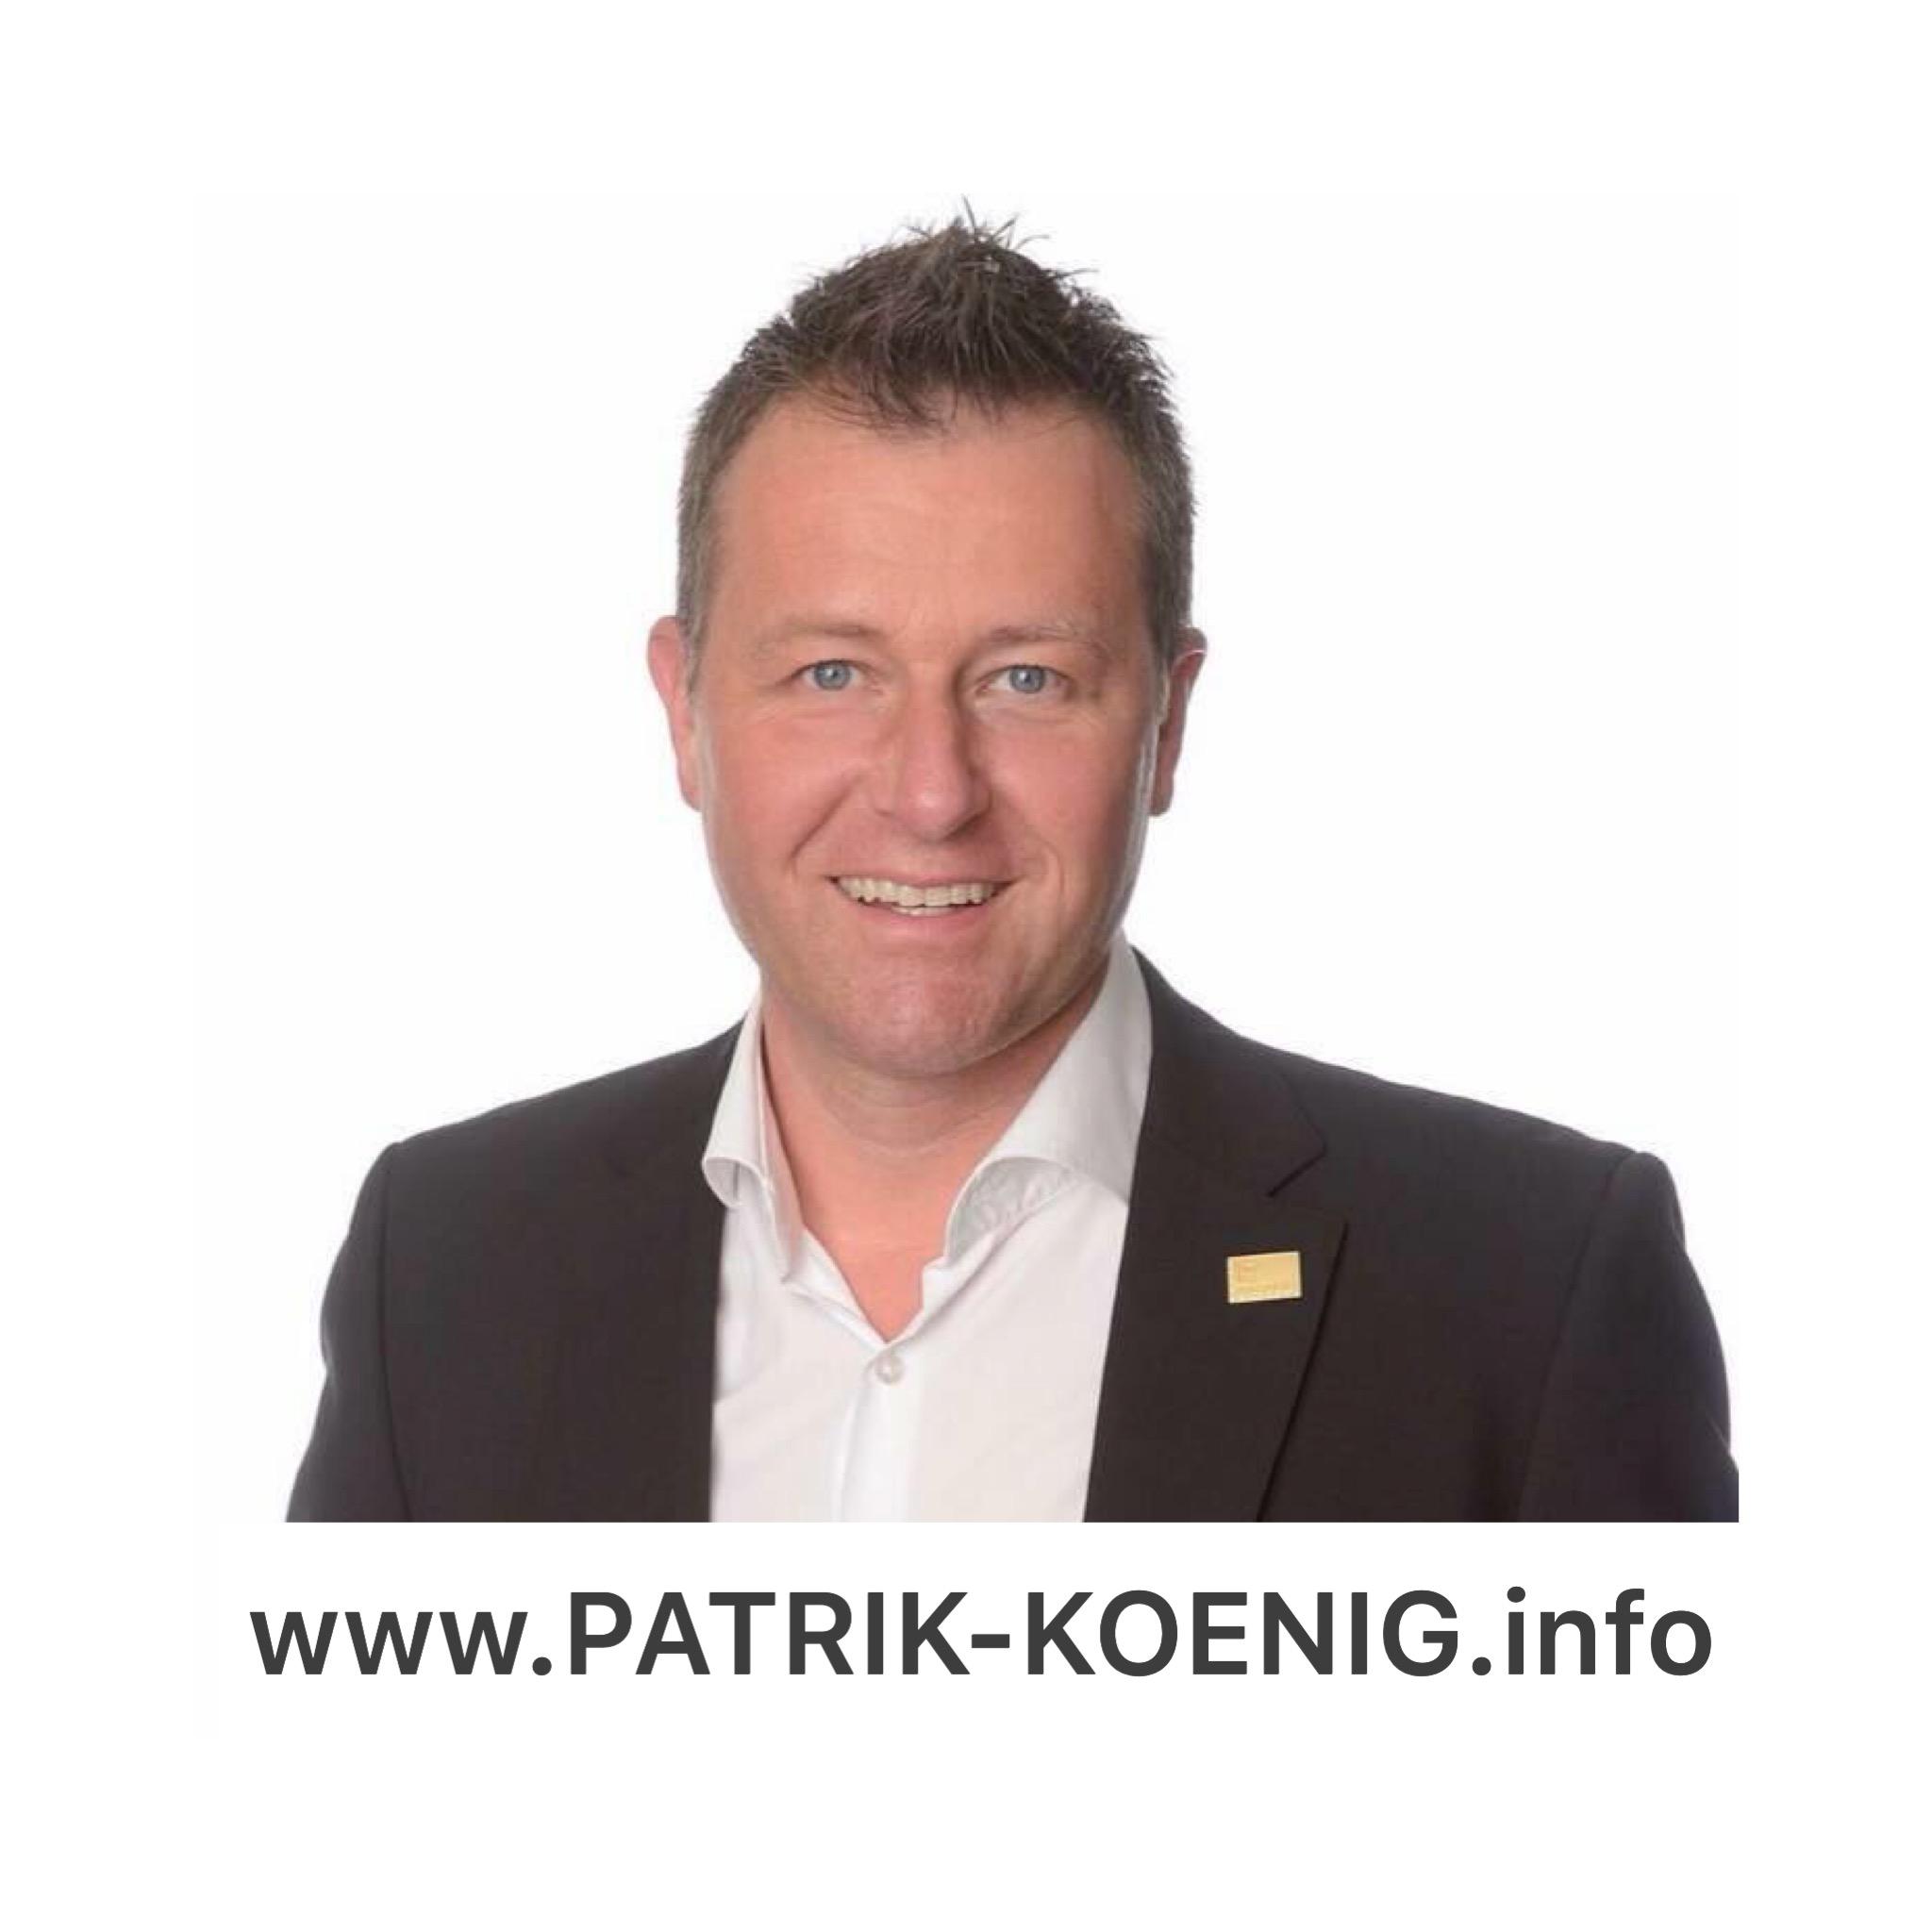 IMMUNSYSTEM MARKETING EXPERTE - PATRIK KOENIG